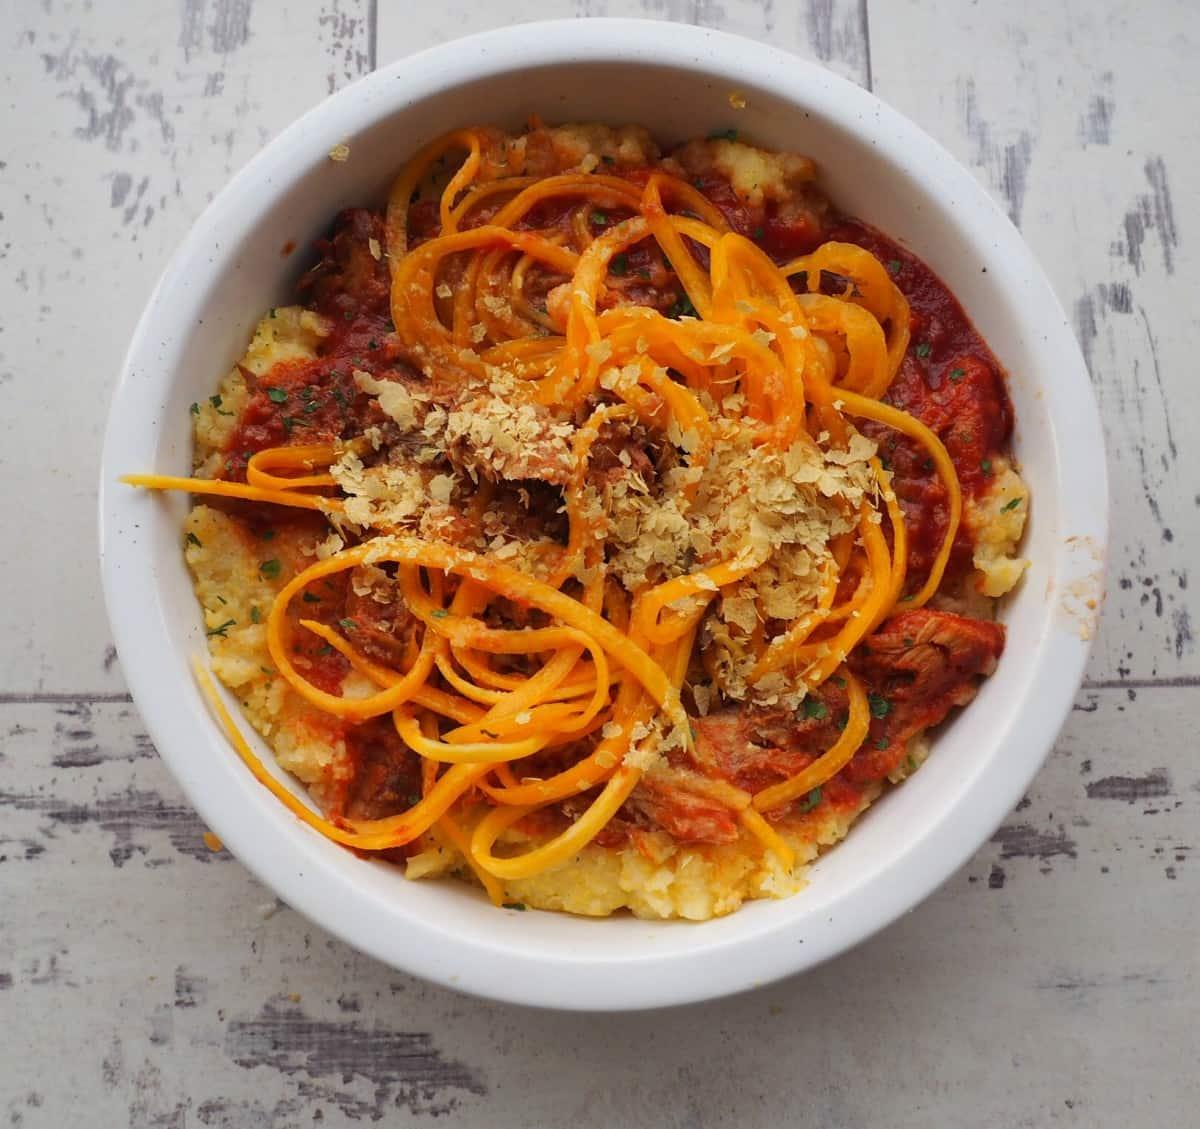 polenta, gluten free polenta recipes, vegan polenta recipes, dairy free polenta recipes, polenta ibs, polenta ibd, la polenteria